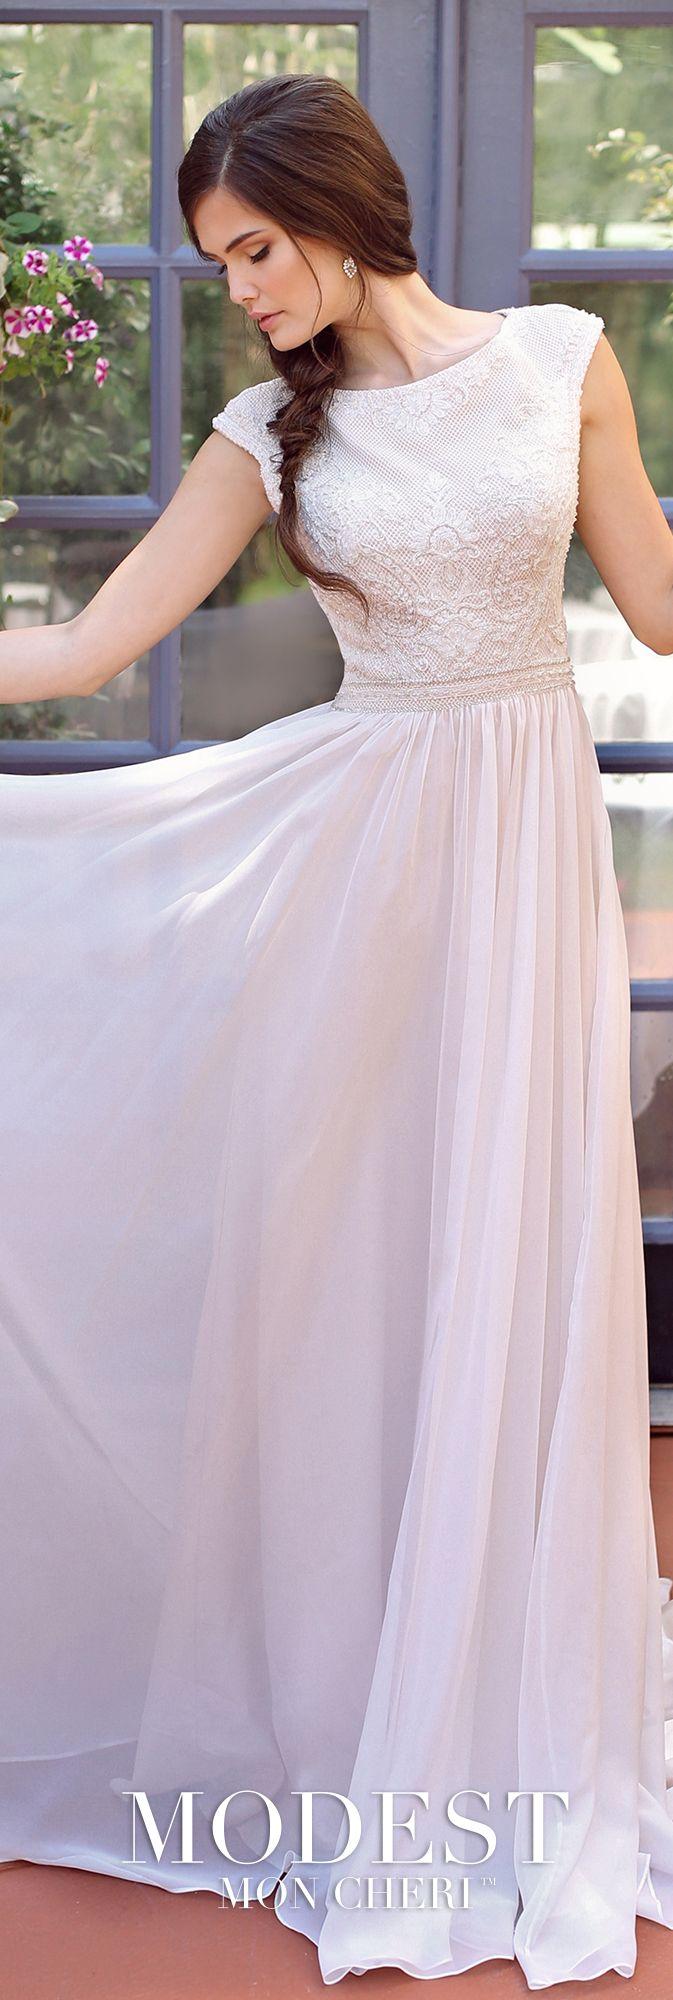 Best 25+ Catholic wedding dresses ideas on Pinterest | Bridal ...